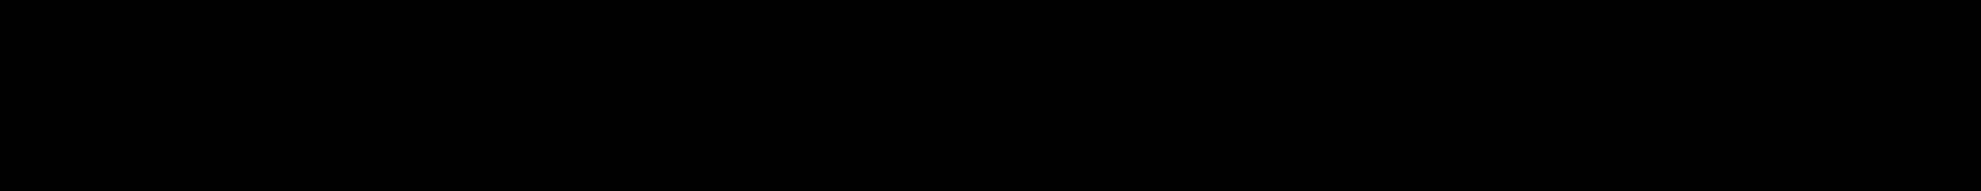 Design System C 300I